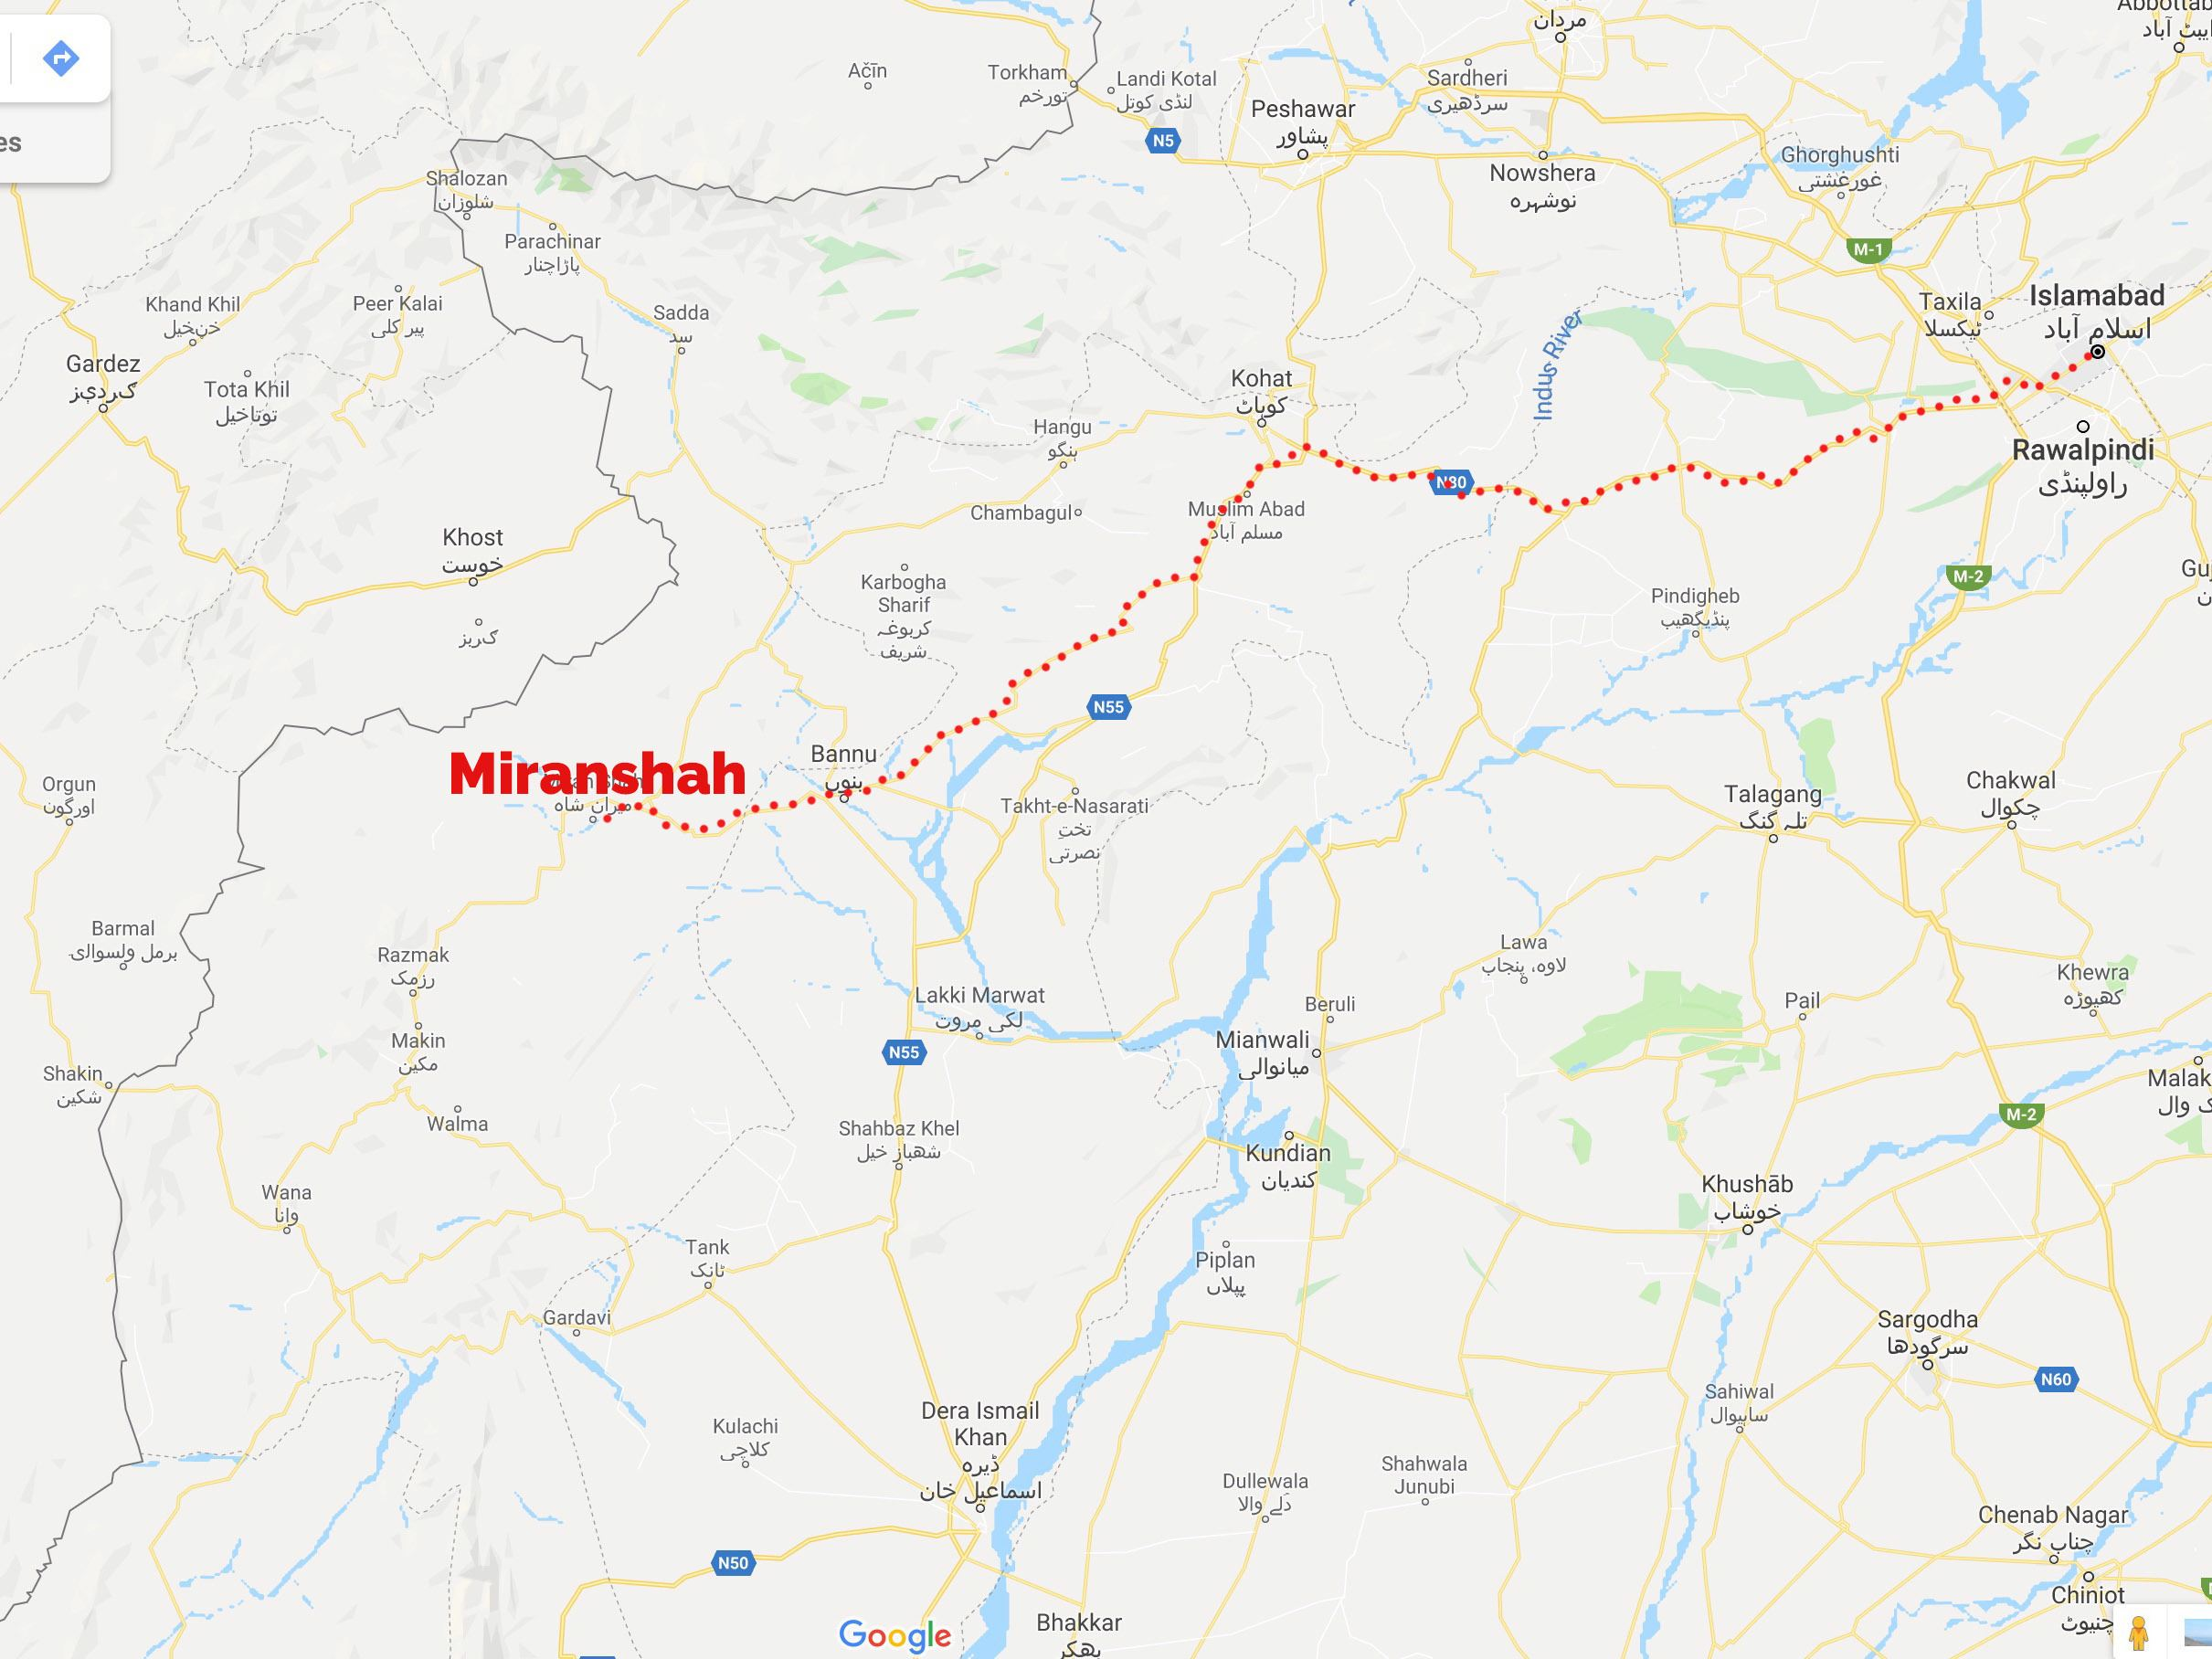 Map of Waziristan